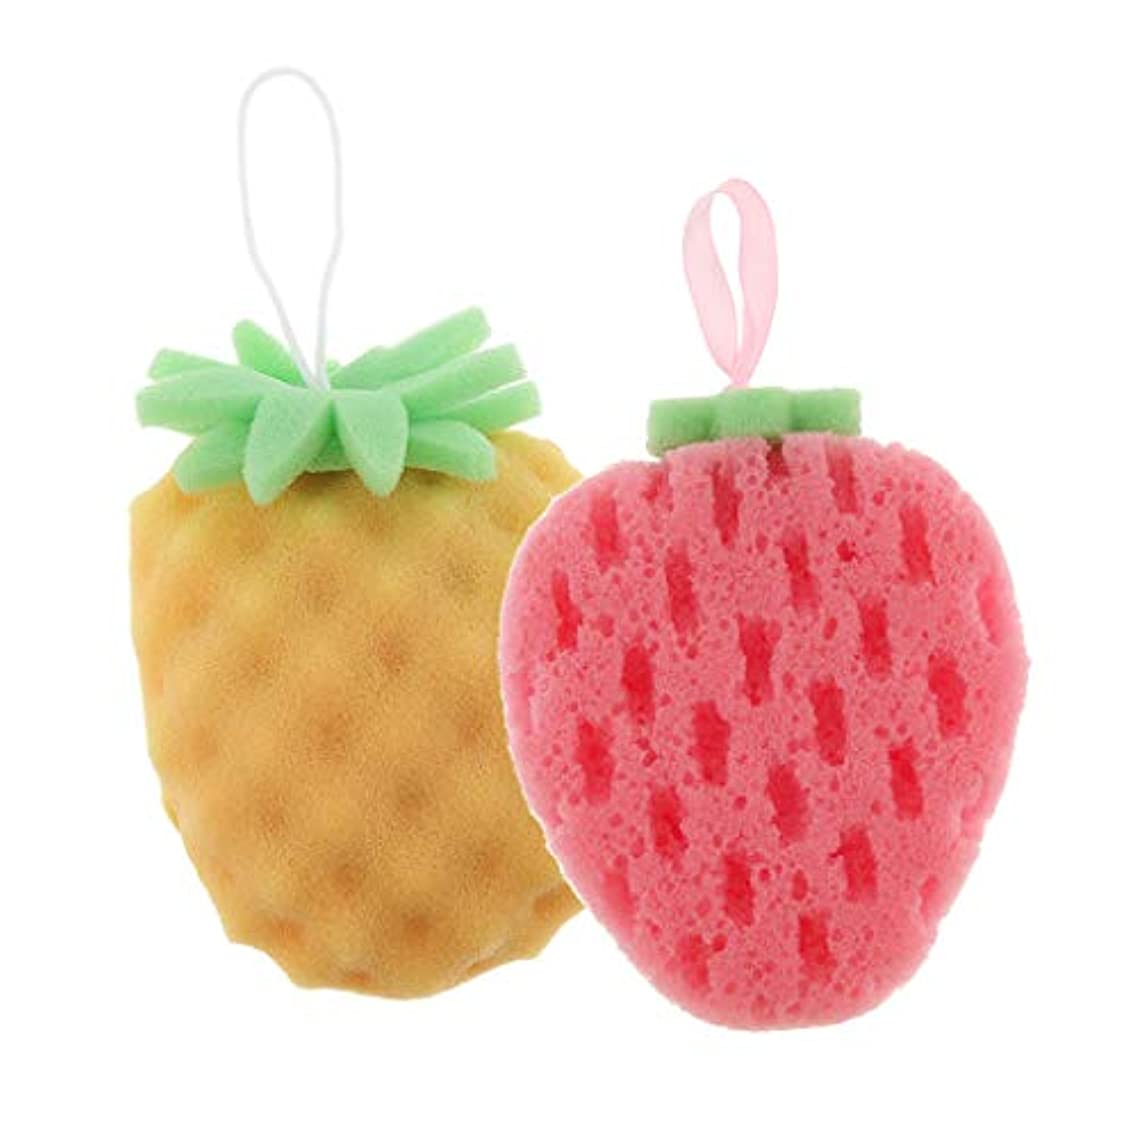 Baoblaze 2個 バススポンジ ボディスポンジ 可愛い フルーツ 果物の形 子供 お風呂